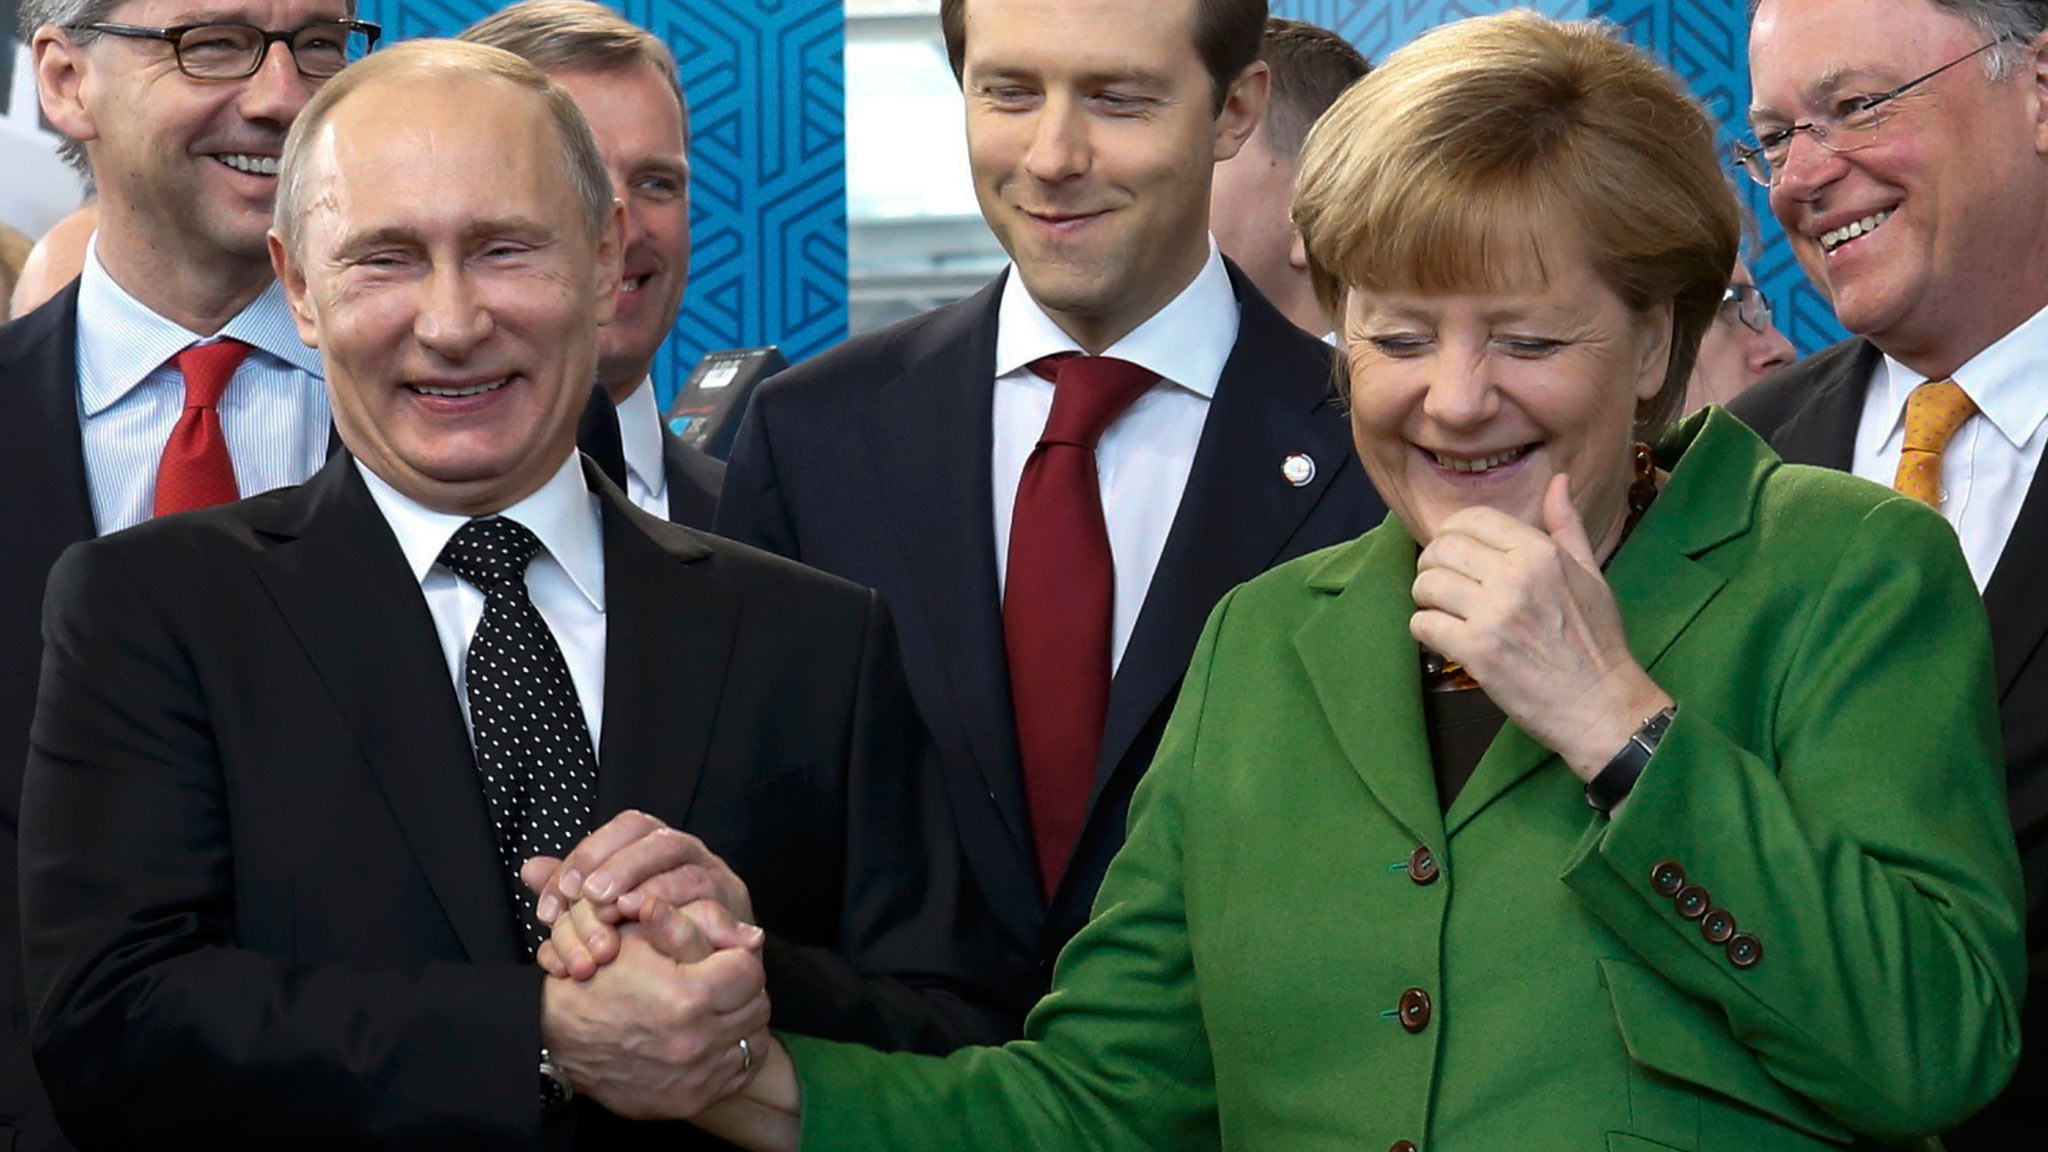 http://komitetns.org/wp-content/uploads/2015/11/Merkel-C5-9Fi-Putin.jpg